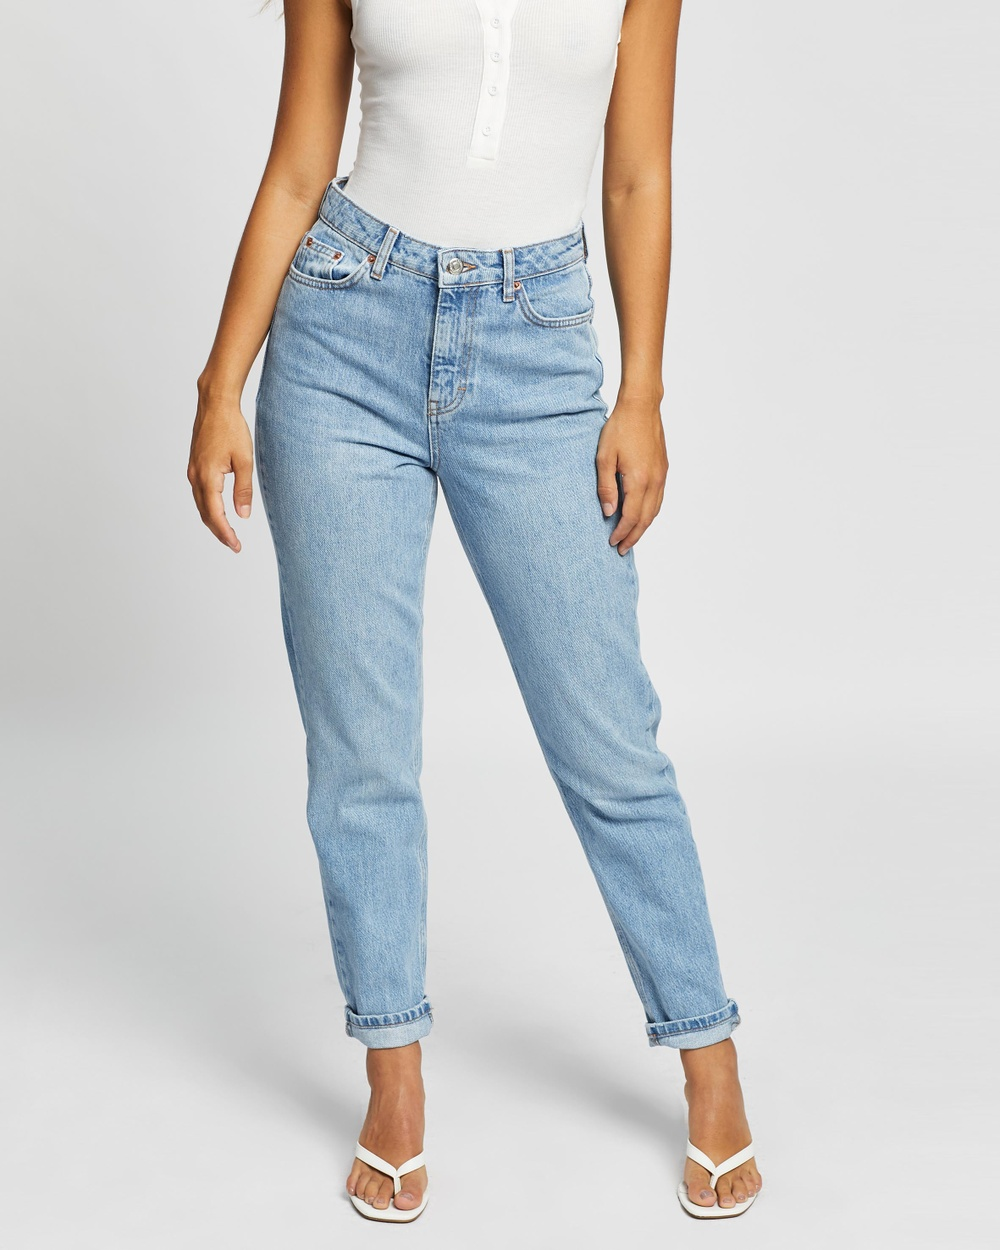 TOPSHOP Bleach Mom Tapered Jeans High-Waisted Bleach Australia